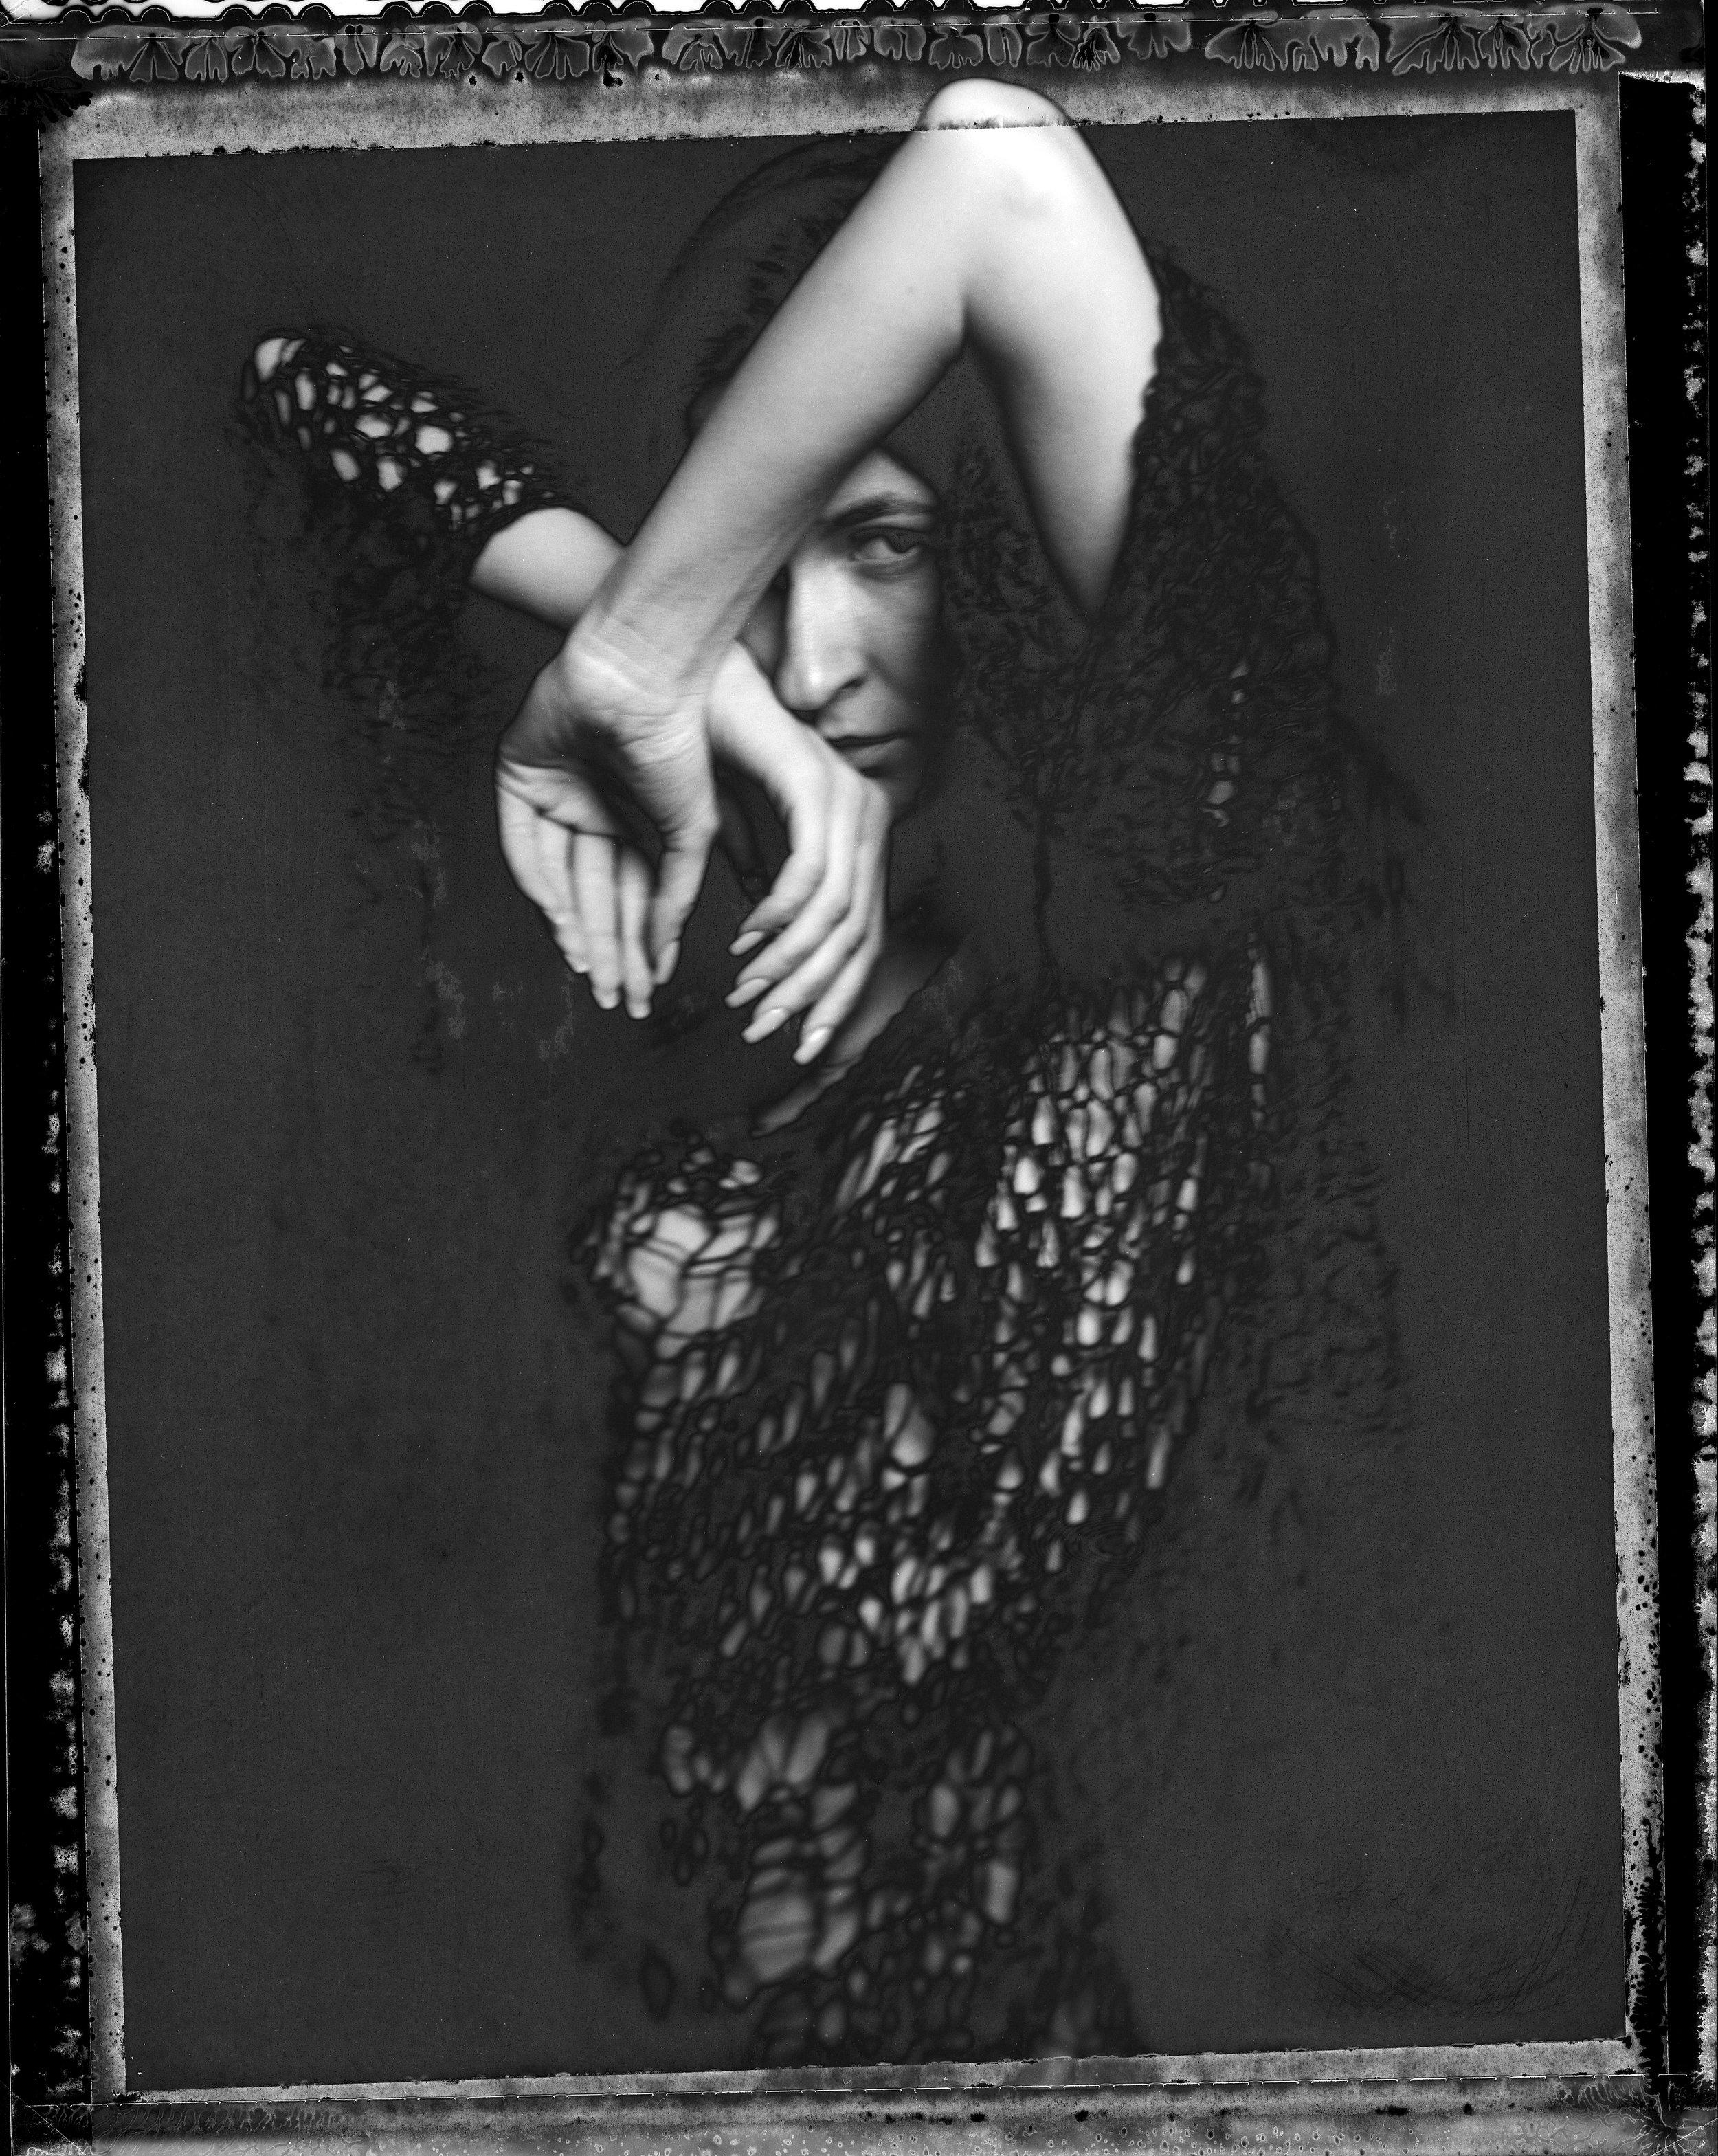 """N. on Polaroid 55 "" by Denis Peaudeau"